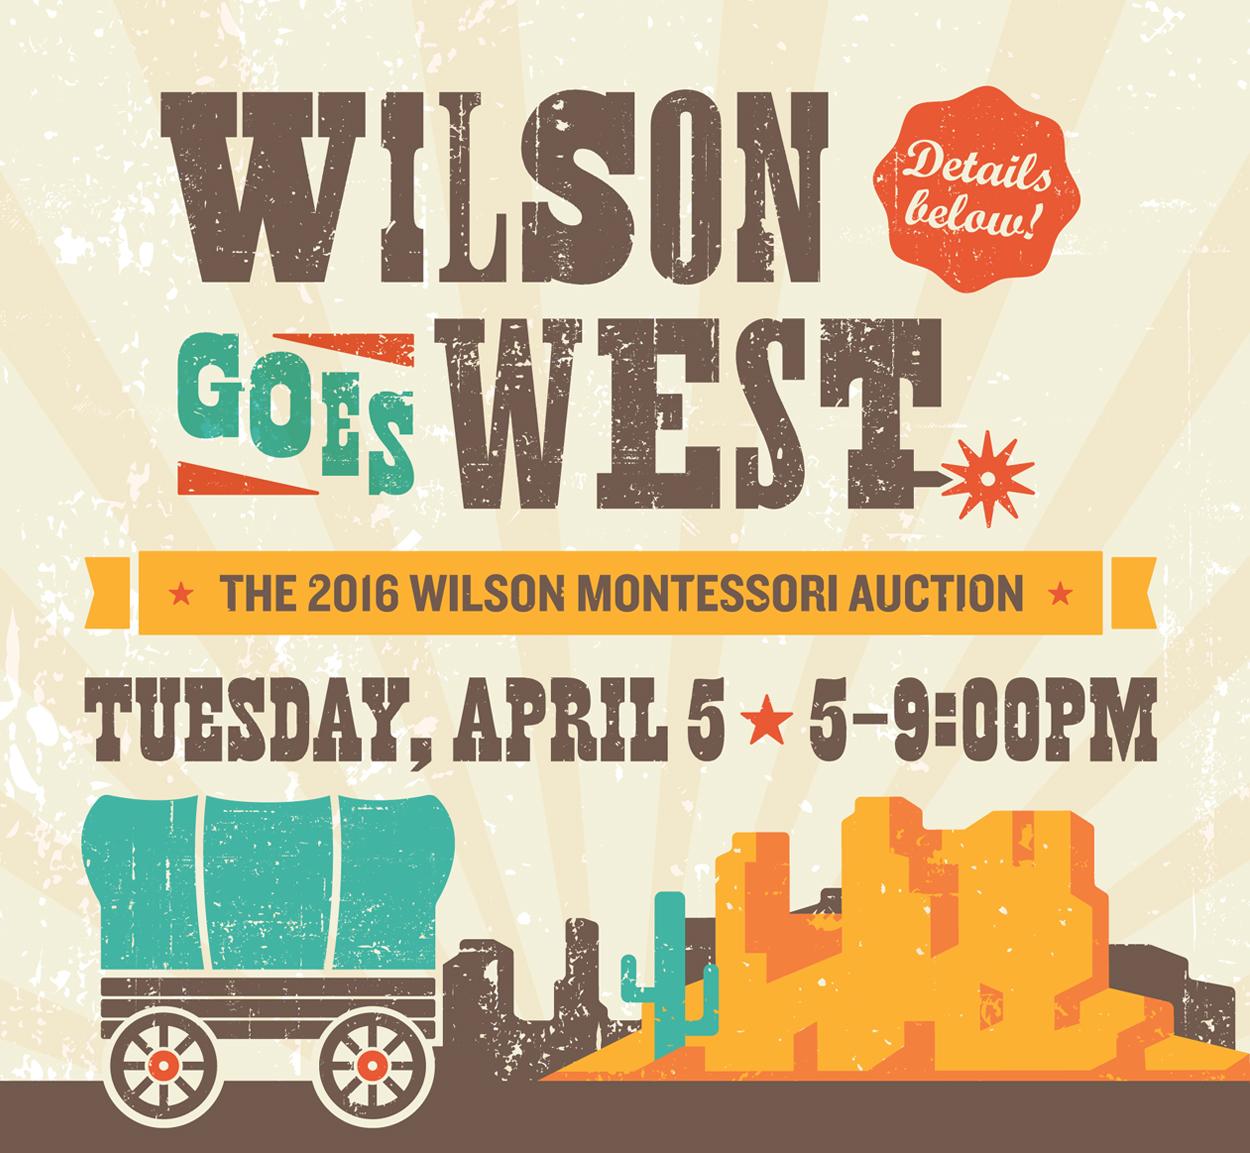 Wilson Auction